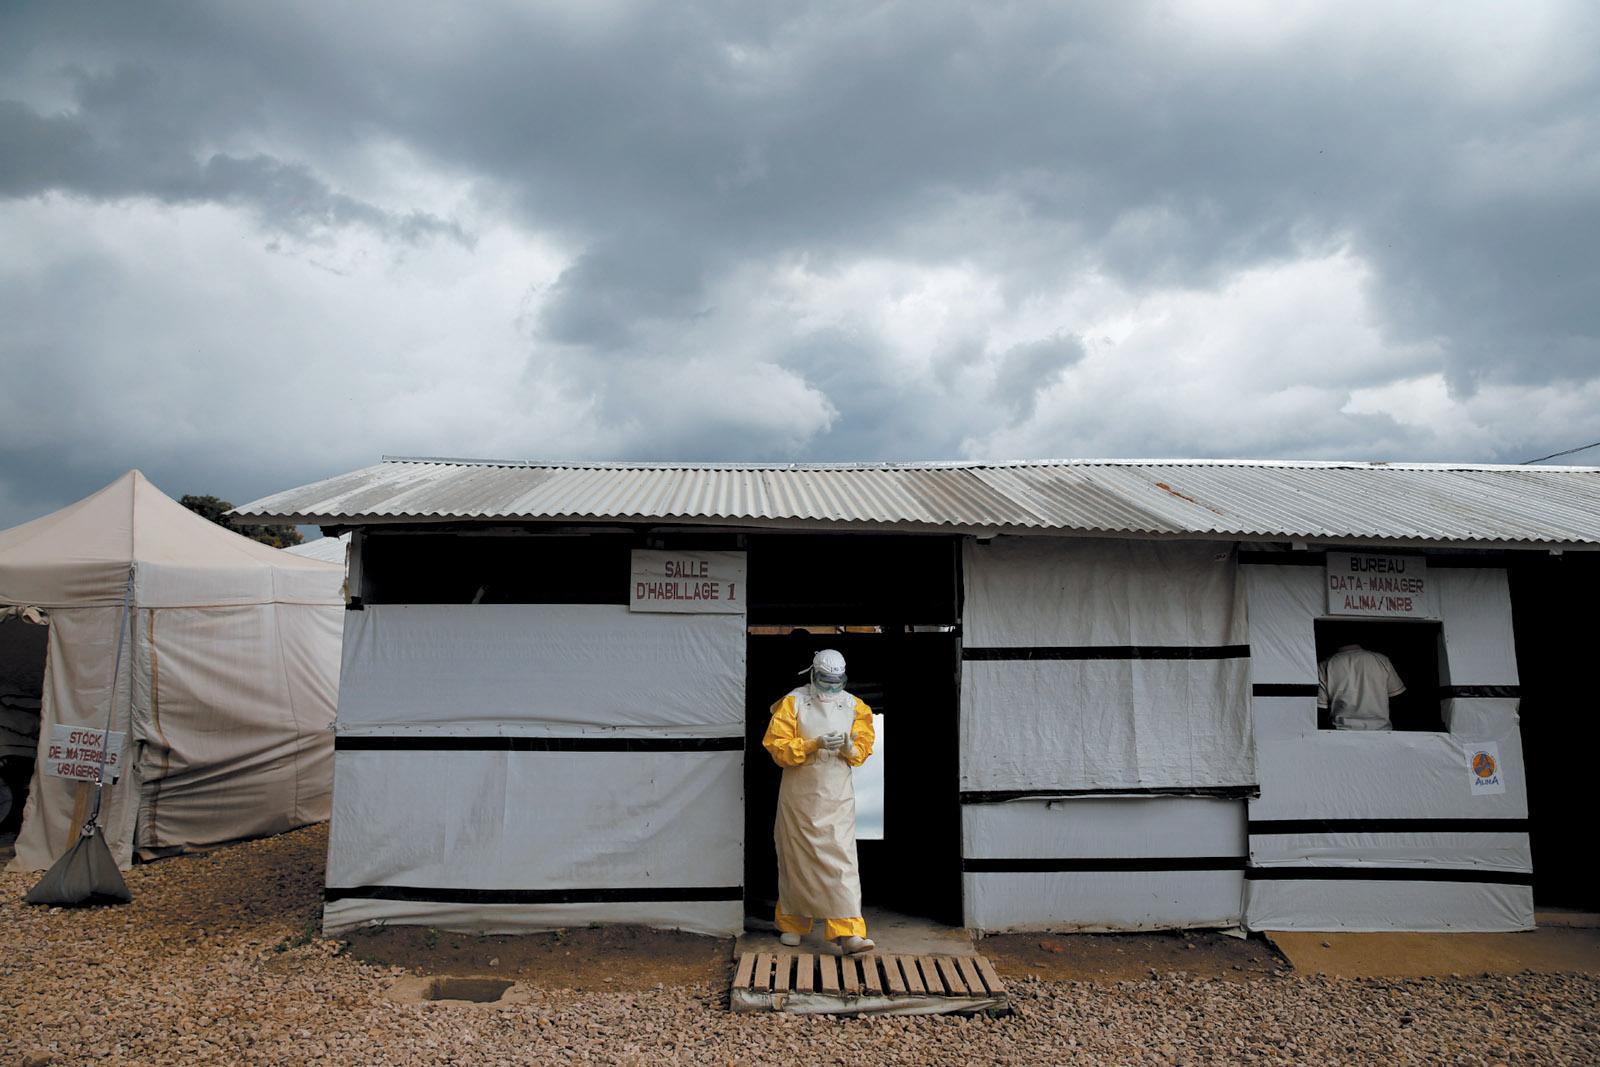 A health worker in an Ebola treatment center, Beni, North Kivu, Congo, May 2019